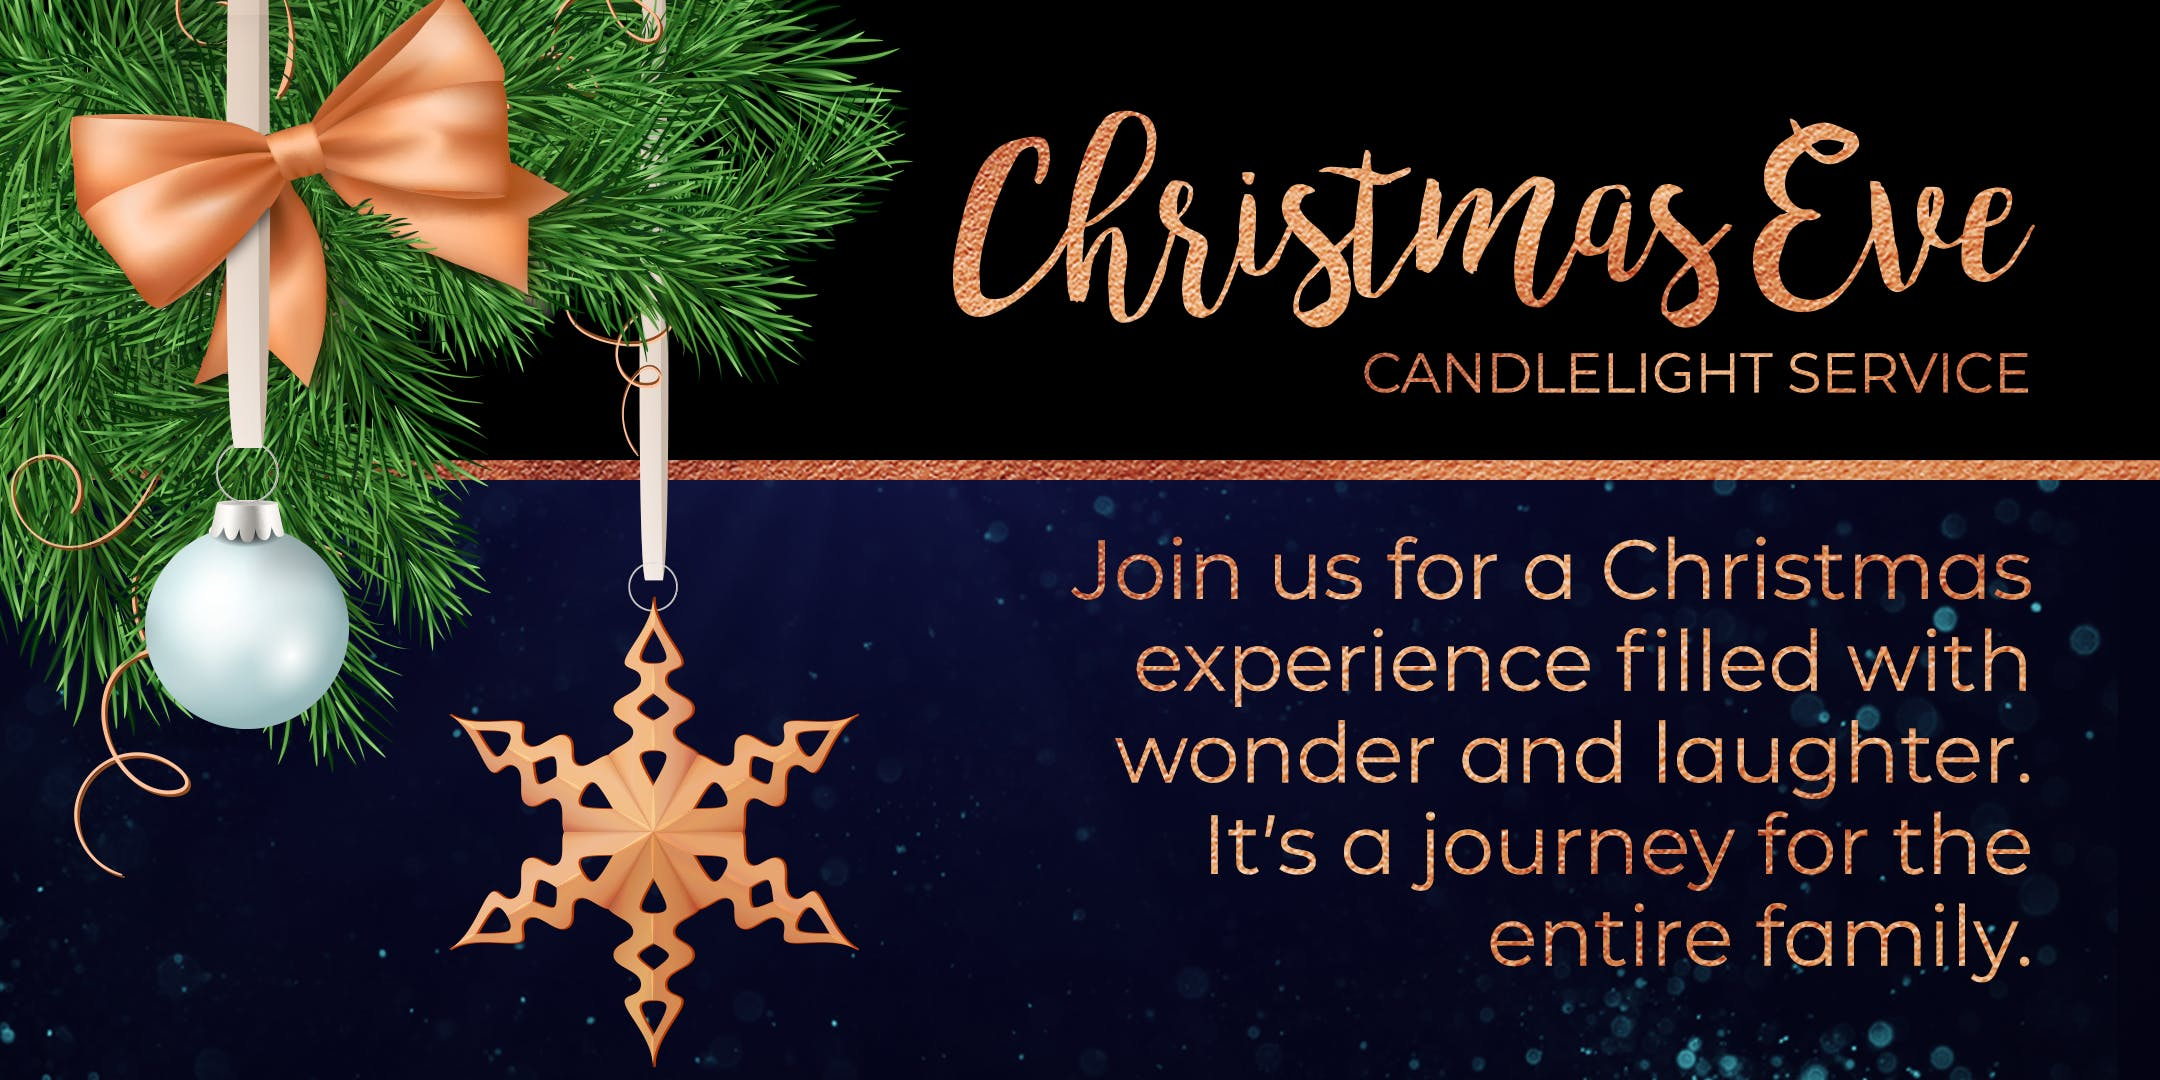 Christmas Eve Candlelight Service | Living Word Gilbert